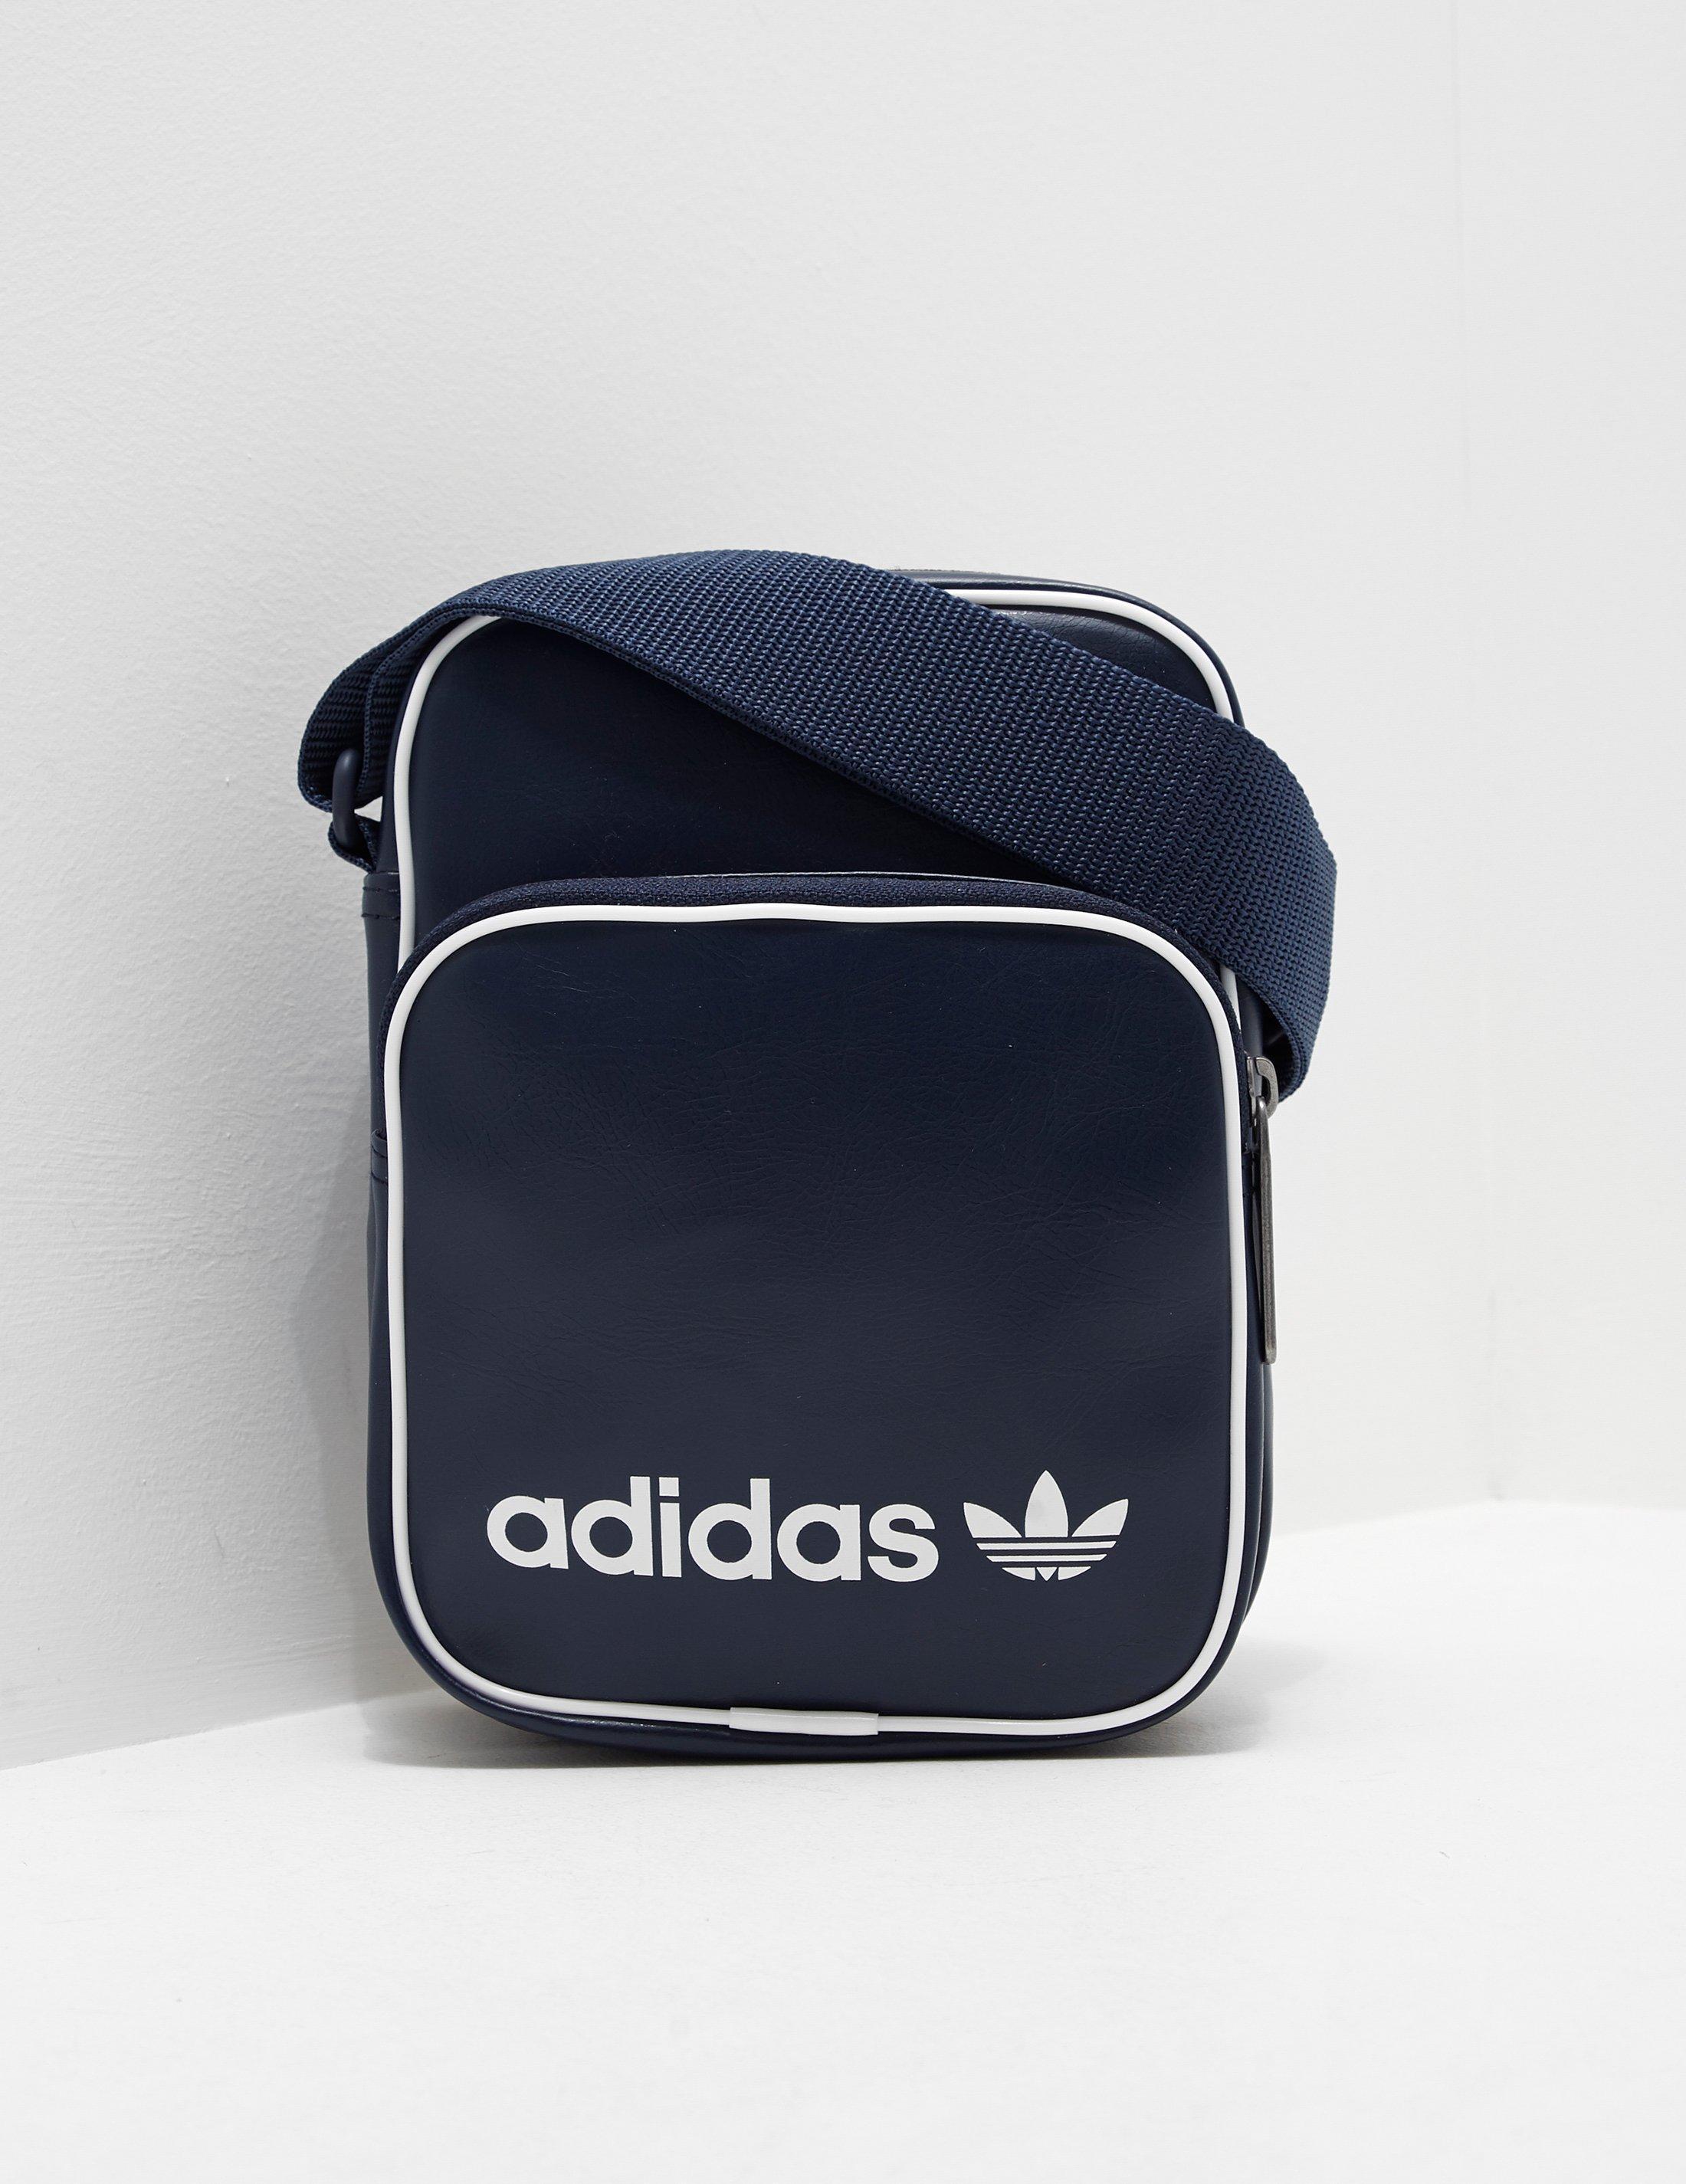 1f7a2bb283 adidas Originals Mens Mini Bag Vintage Navy navy in Blue for Men - Lyst